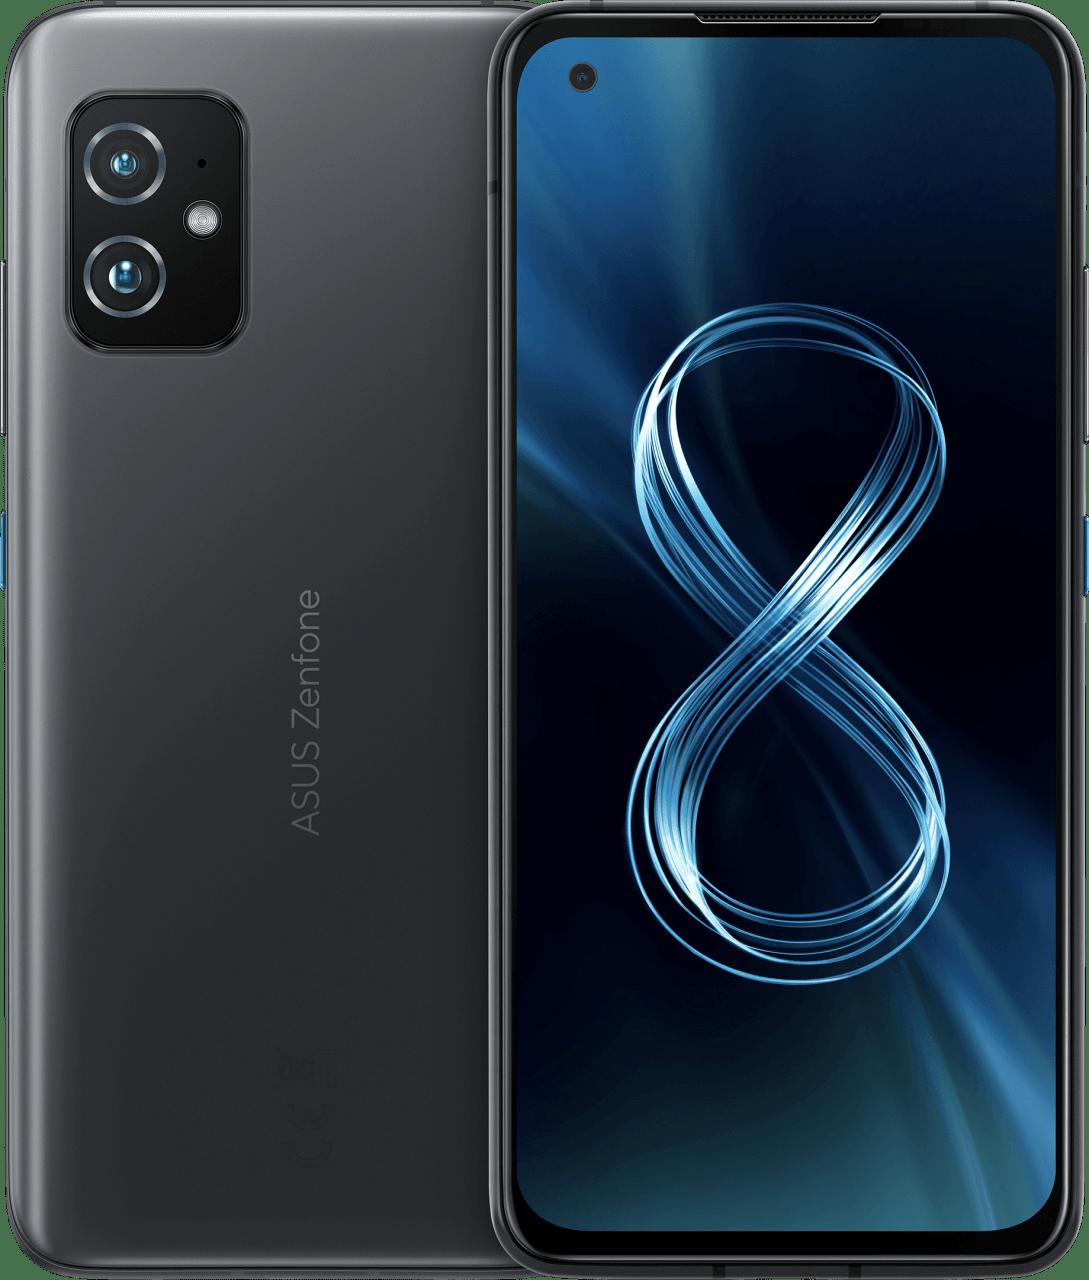 Black Asus Smartphone Zenfone 8 - 256GB - Dual Sim.1